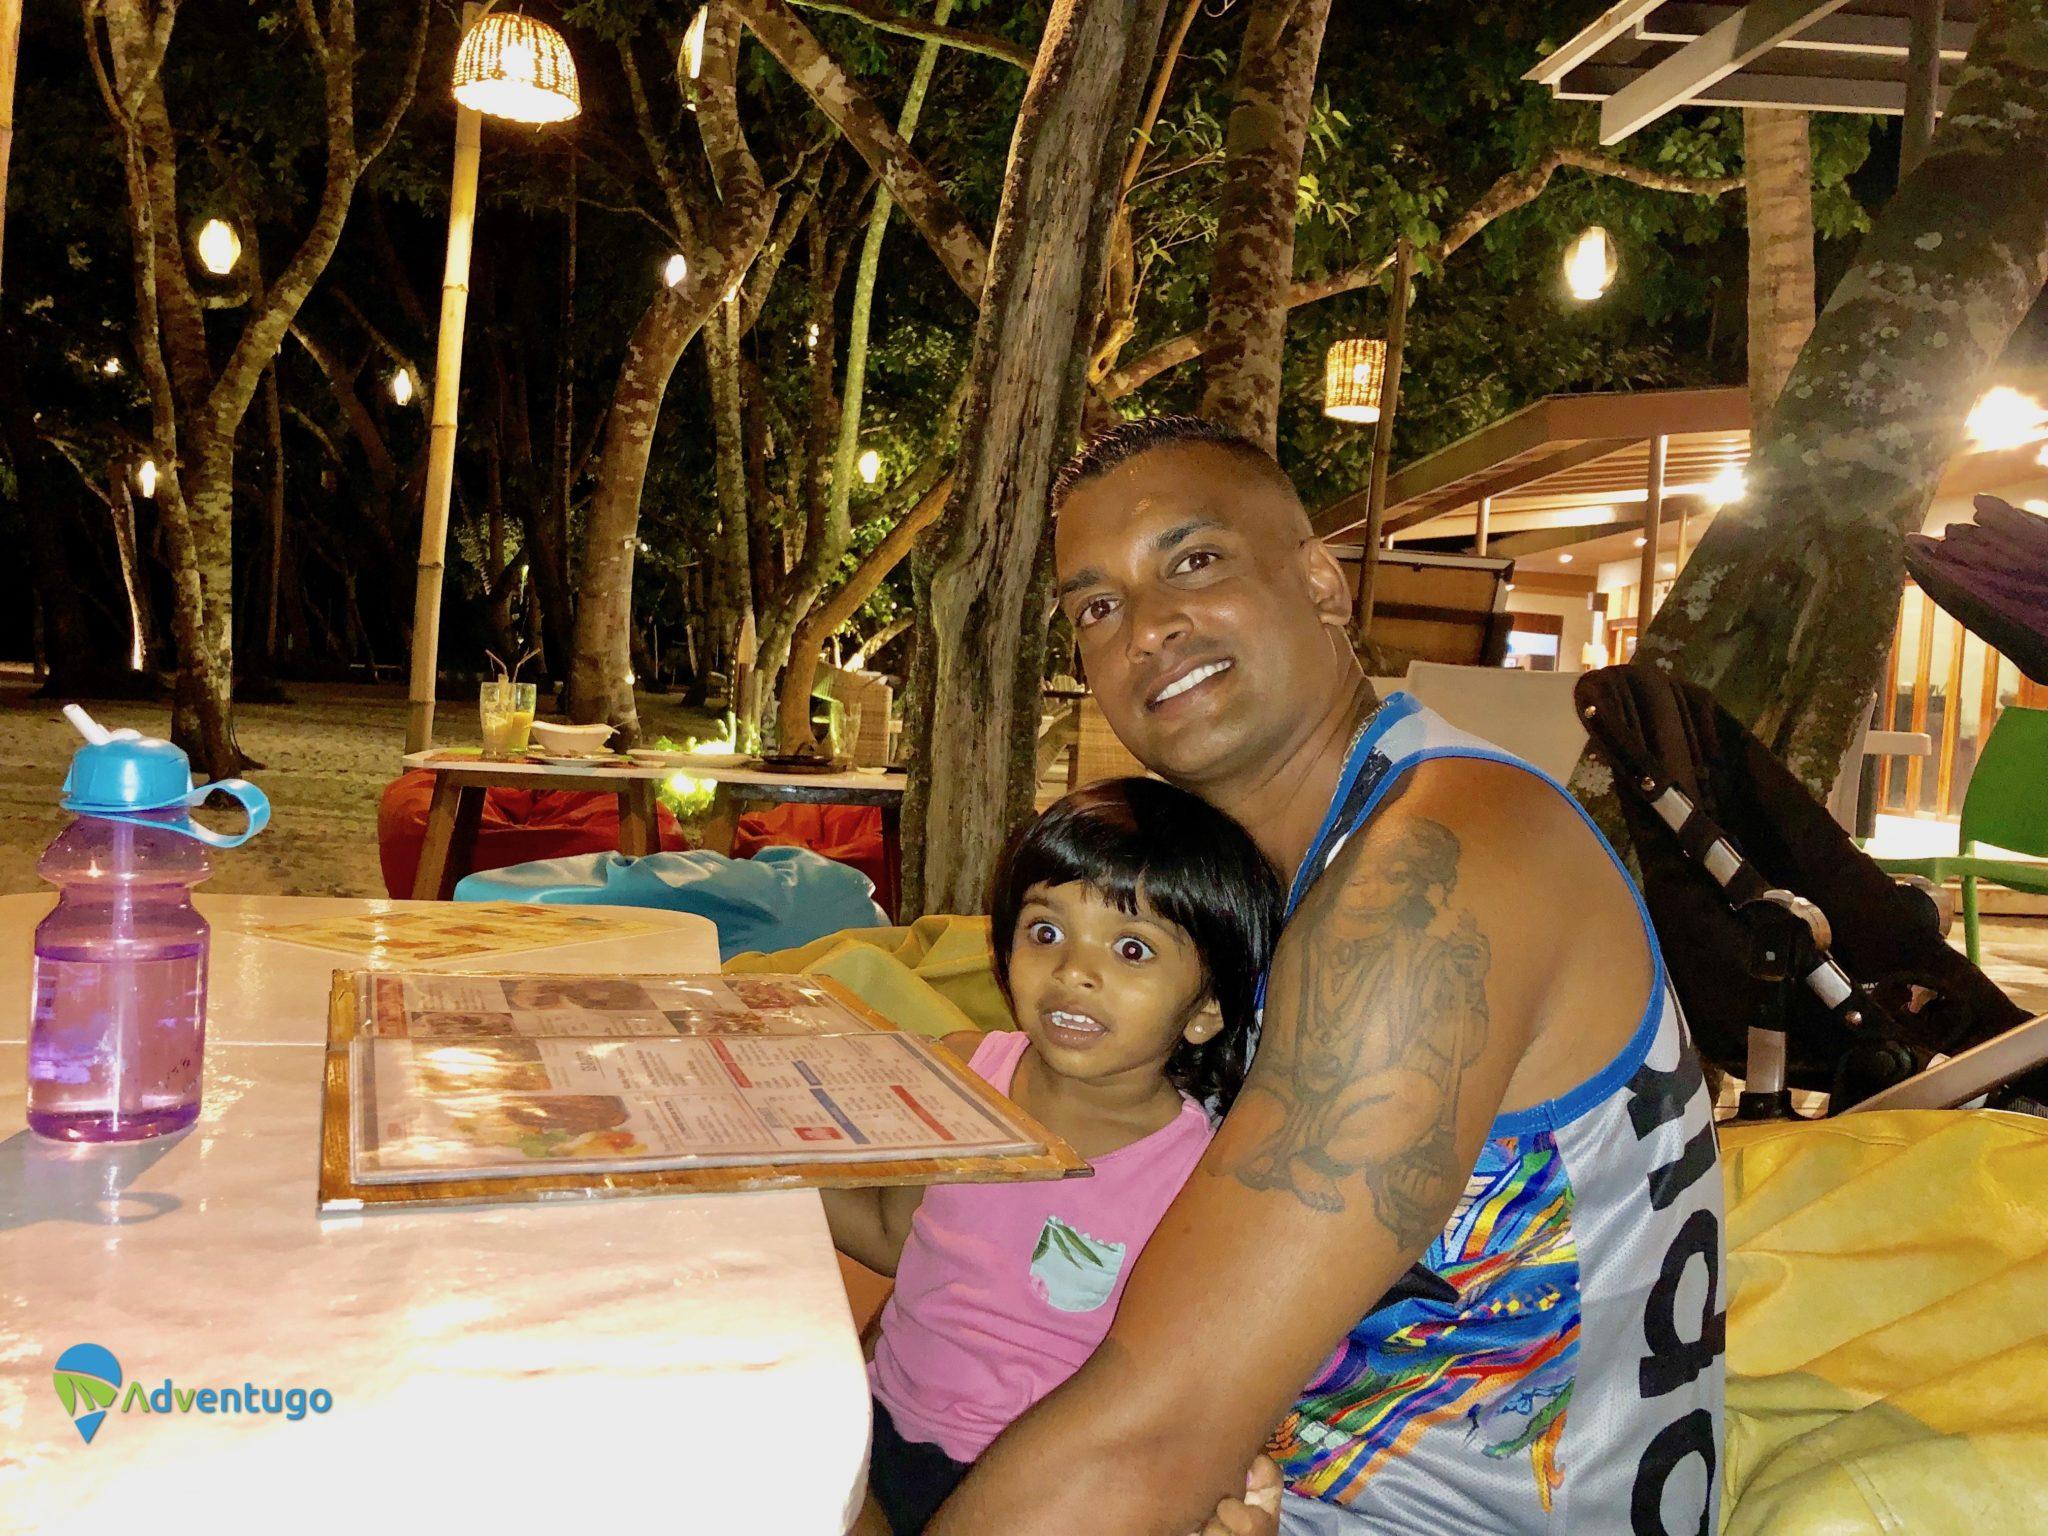 Another restaurant Pic at Lio Beach El Nido, Philippines